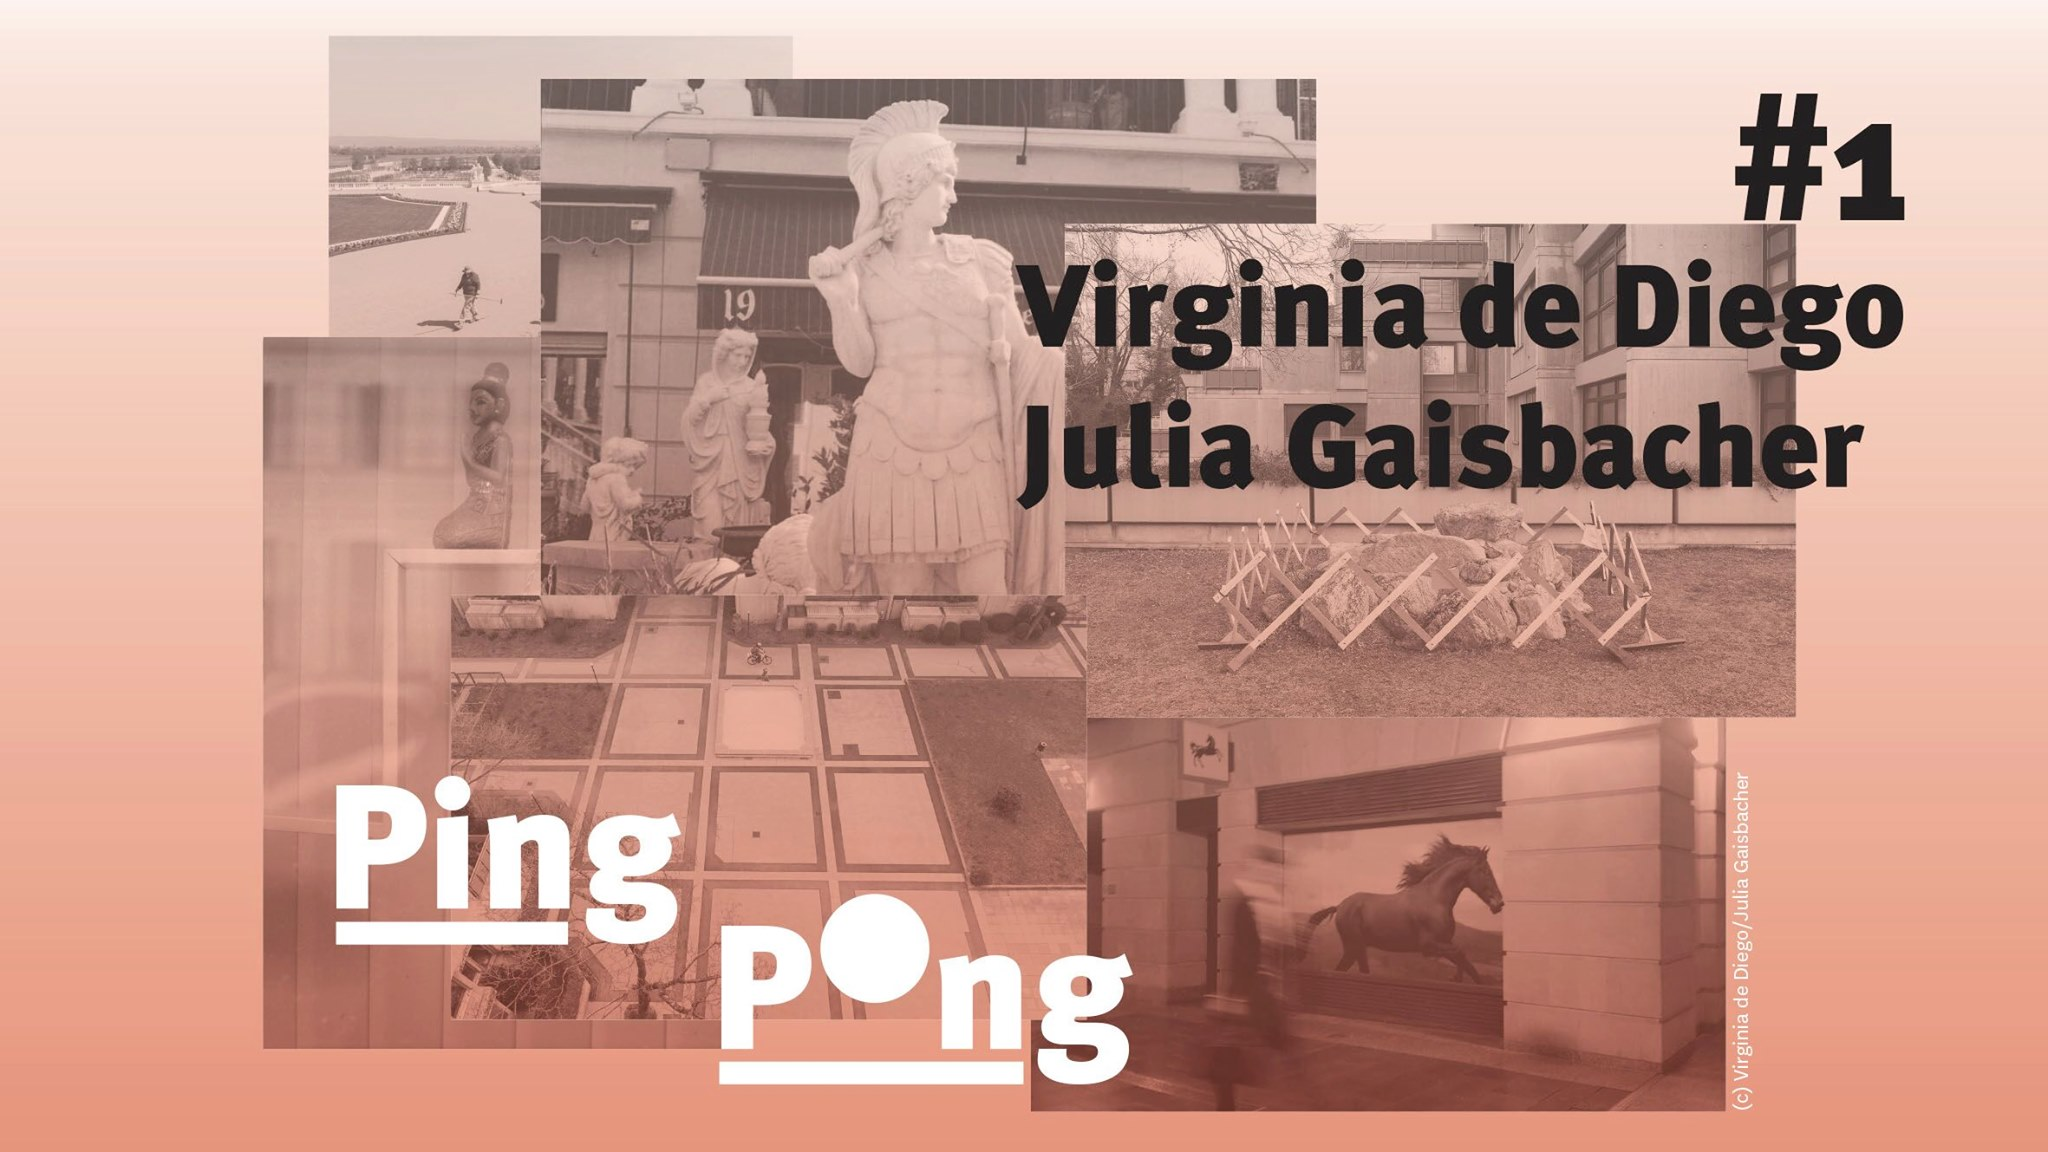 PING PONG #1 Virginia de Diego und Julia Gaisbacher